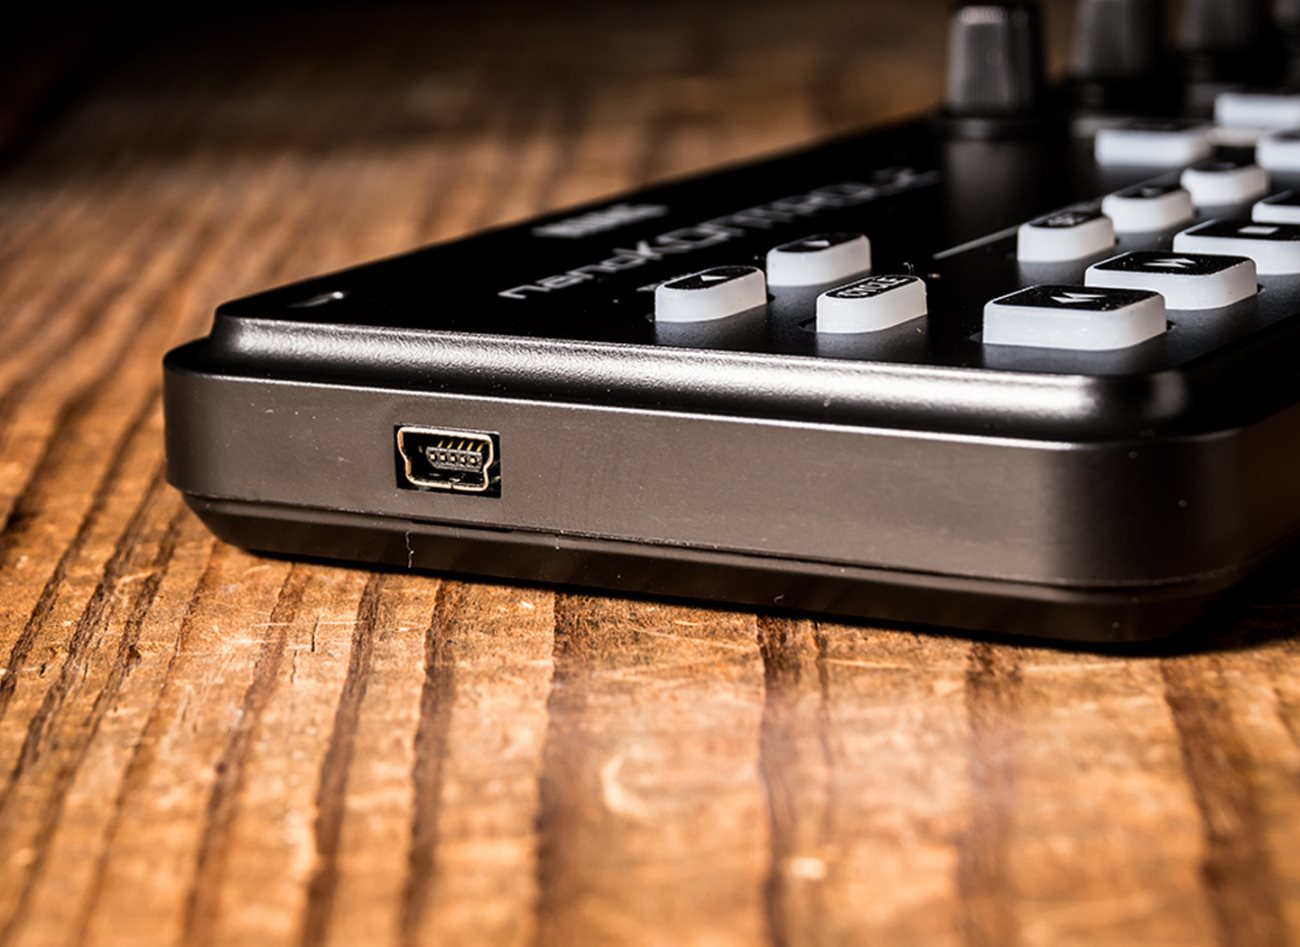 Korg nanoKONTROL 2 Slim-Line USB Controller - Black